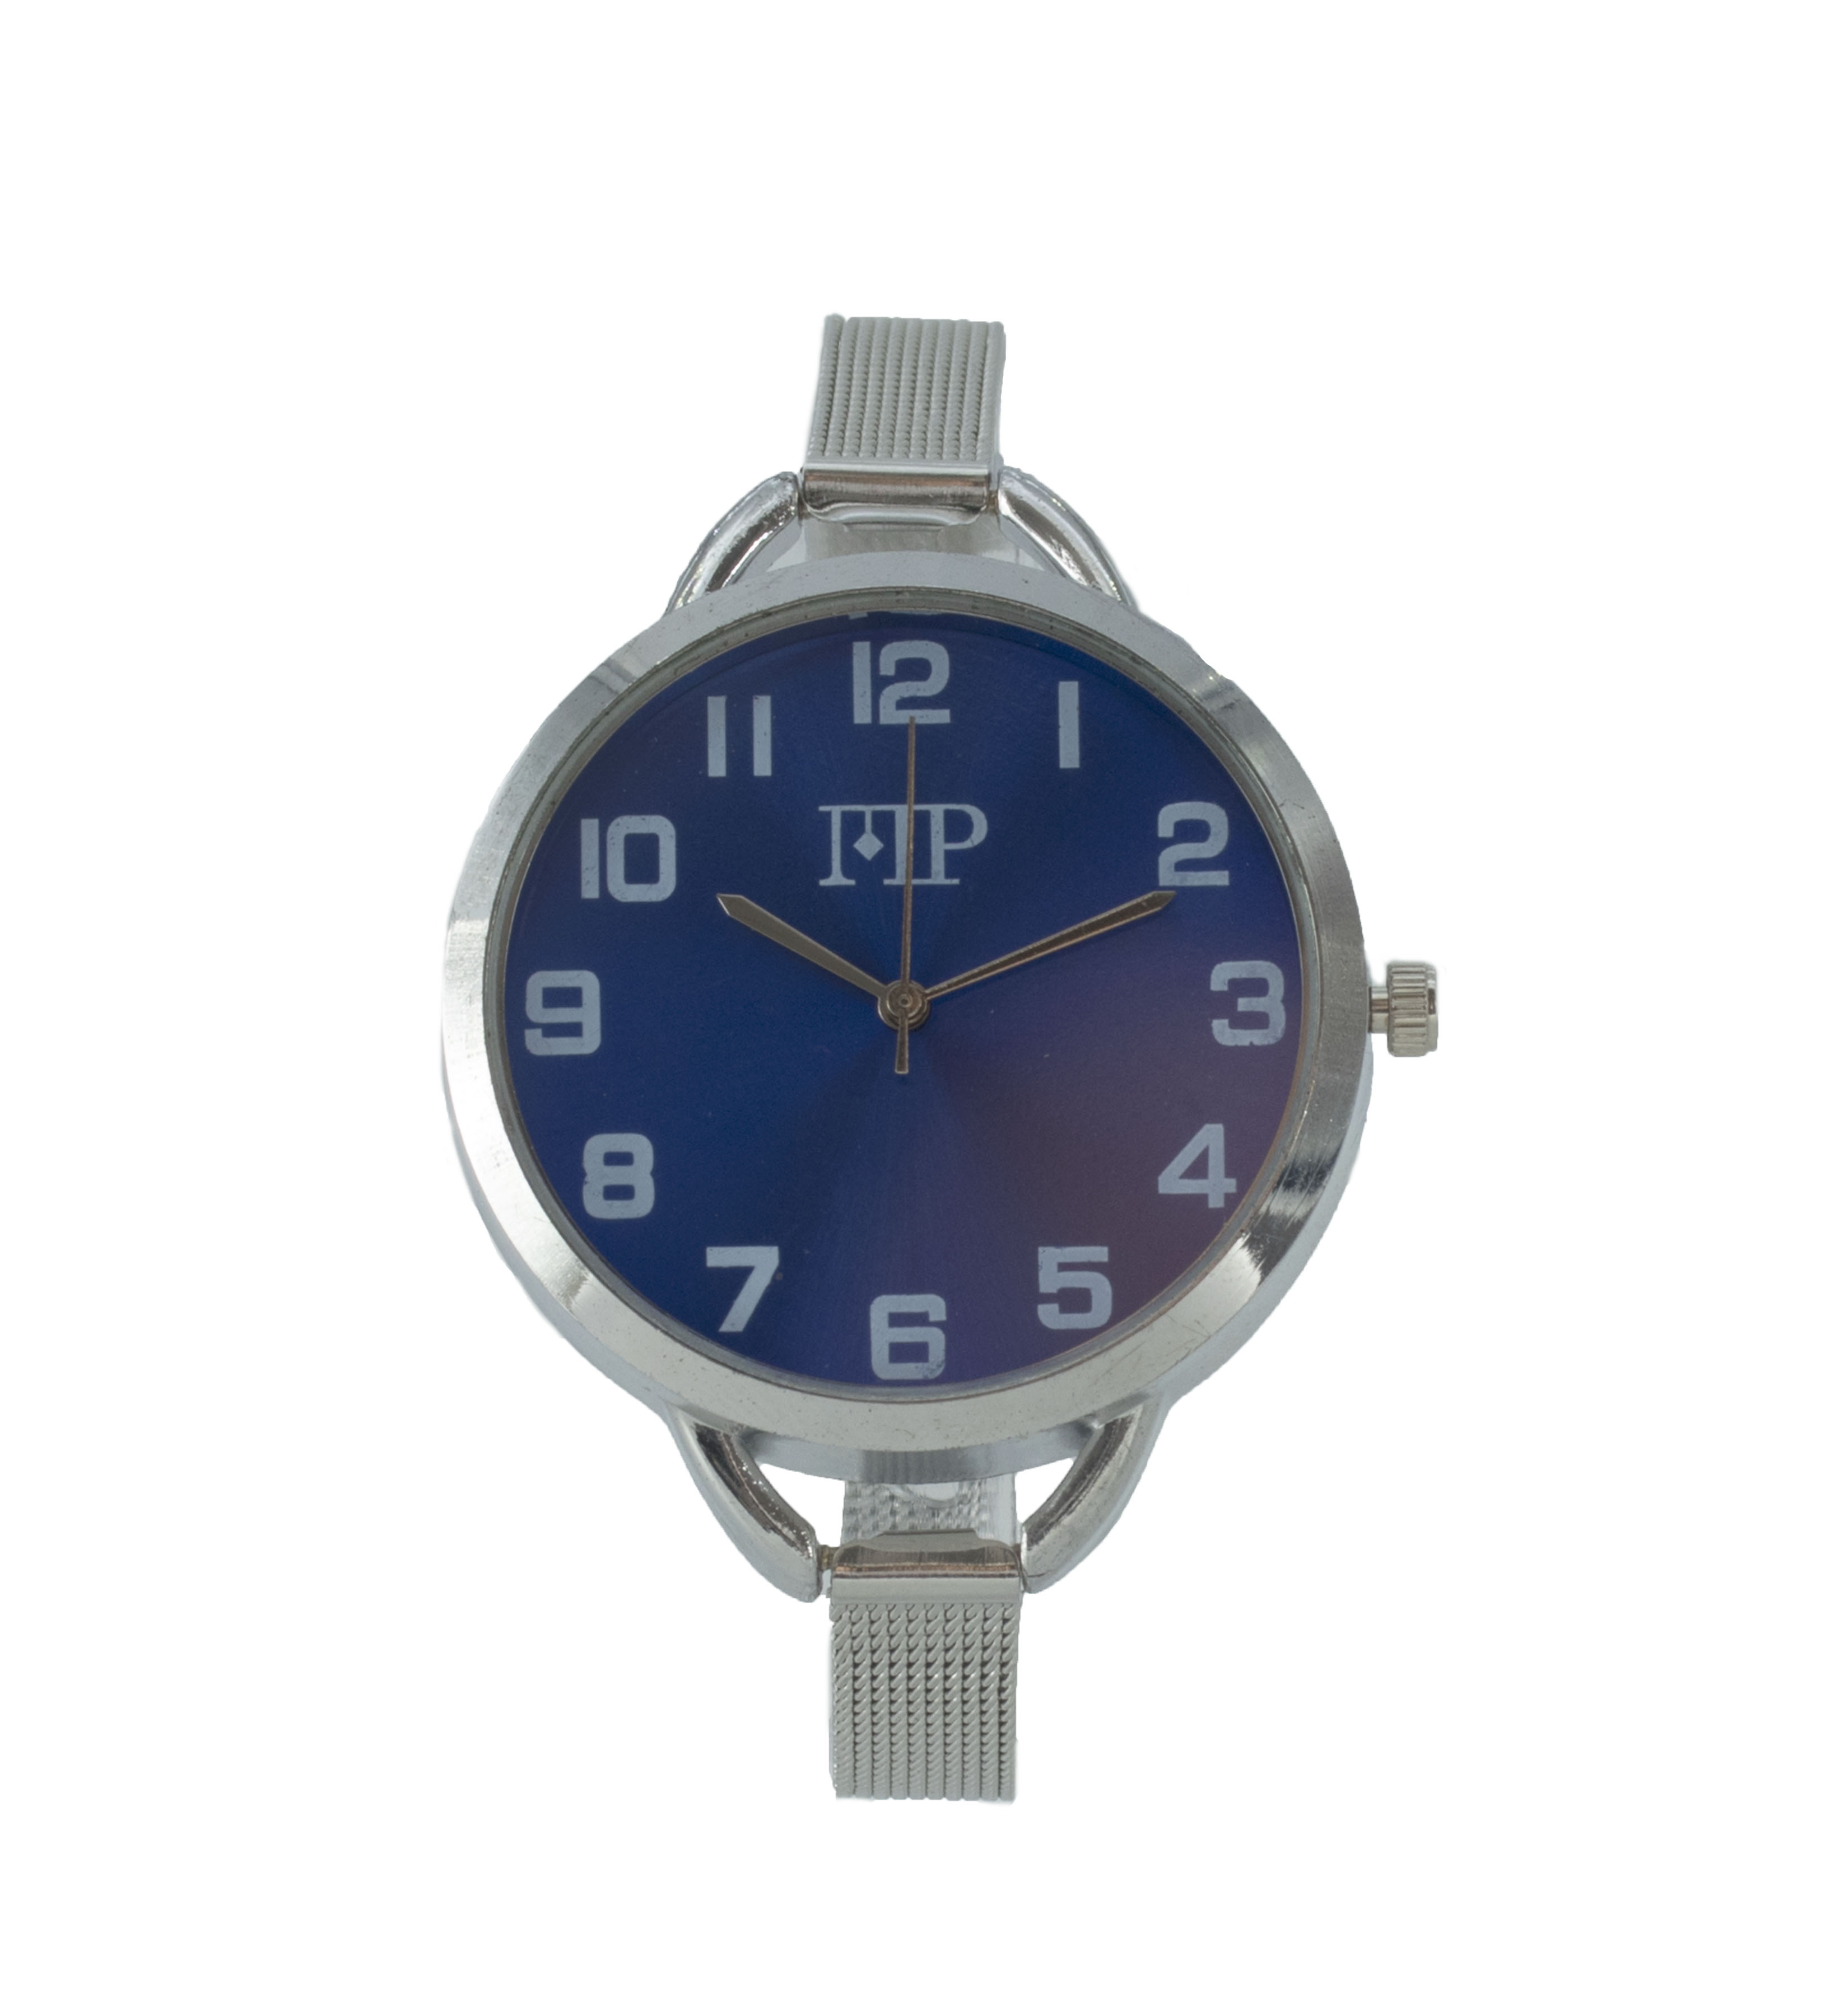 Comprar Marsan Piel Reloj analógico Suto azul